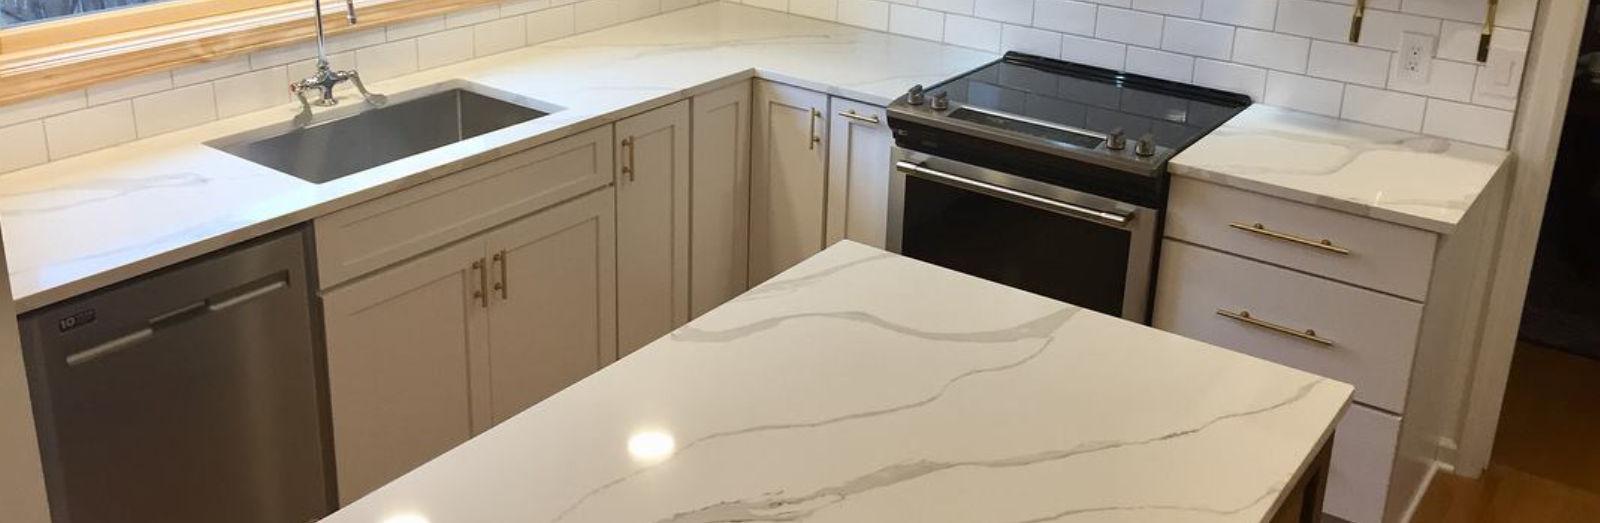 Custom Countertops Rochester NY | Lawrence Natural Stone